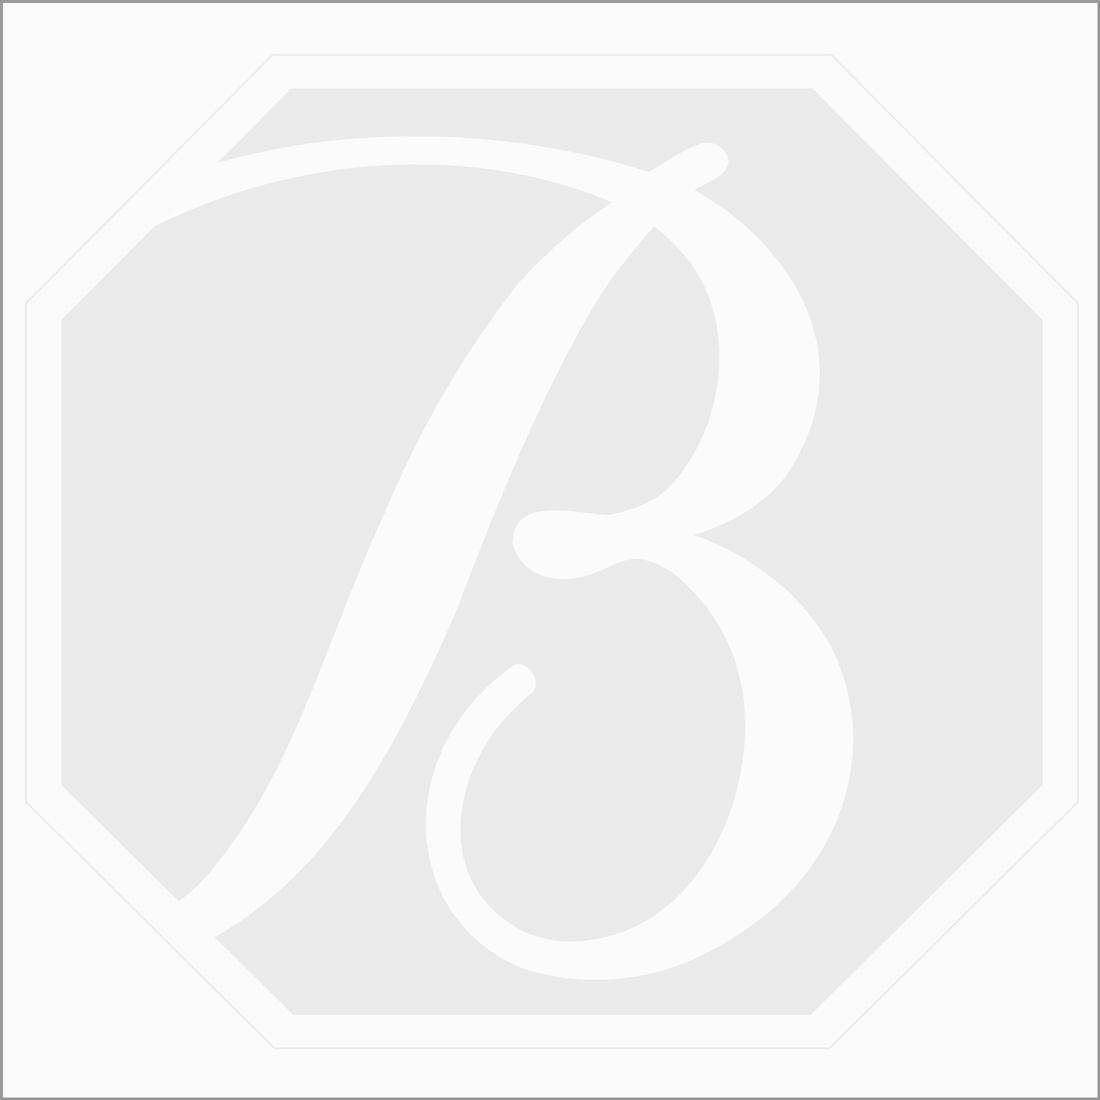 3 Lines - Medium Tones Smooth Aquamarine Beads - 1057 cts - 7 x 14.2 mm to 7 x 20.8 mm (AQSB1012)